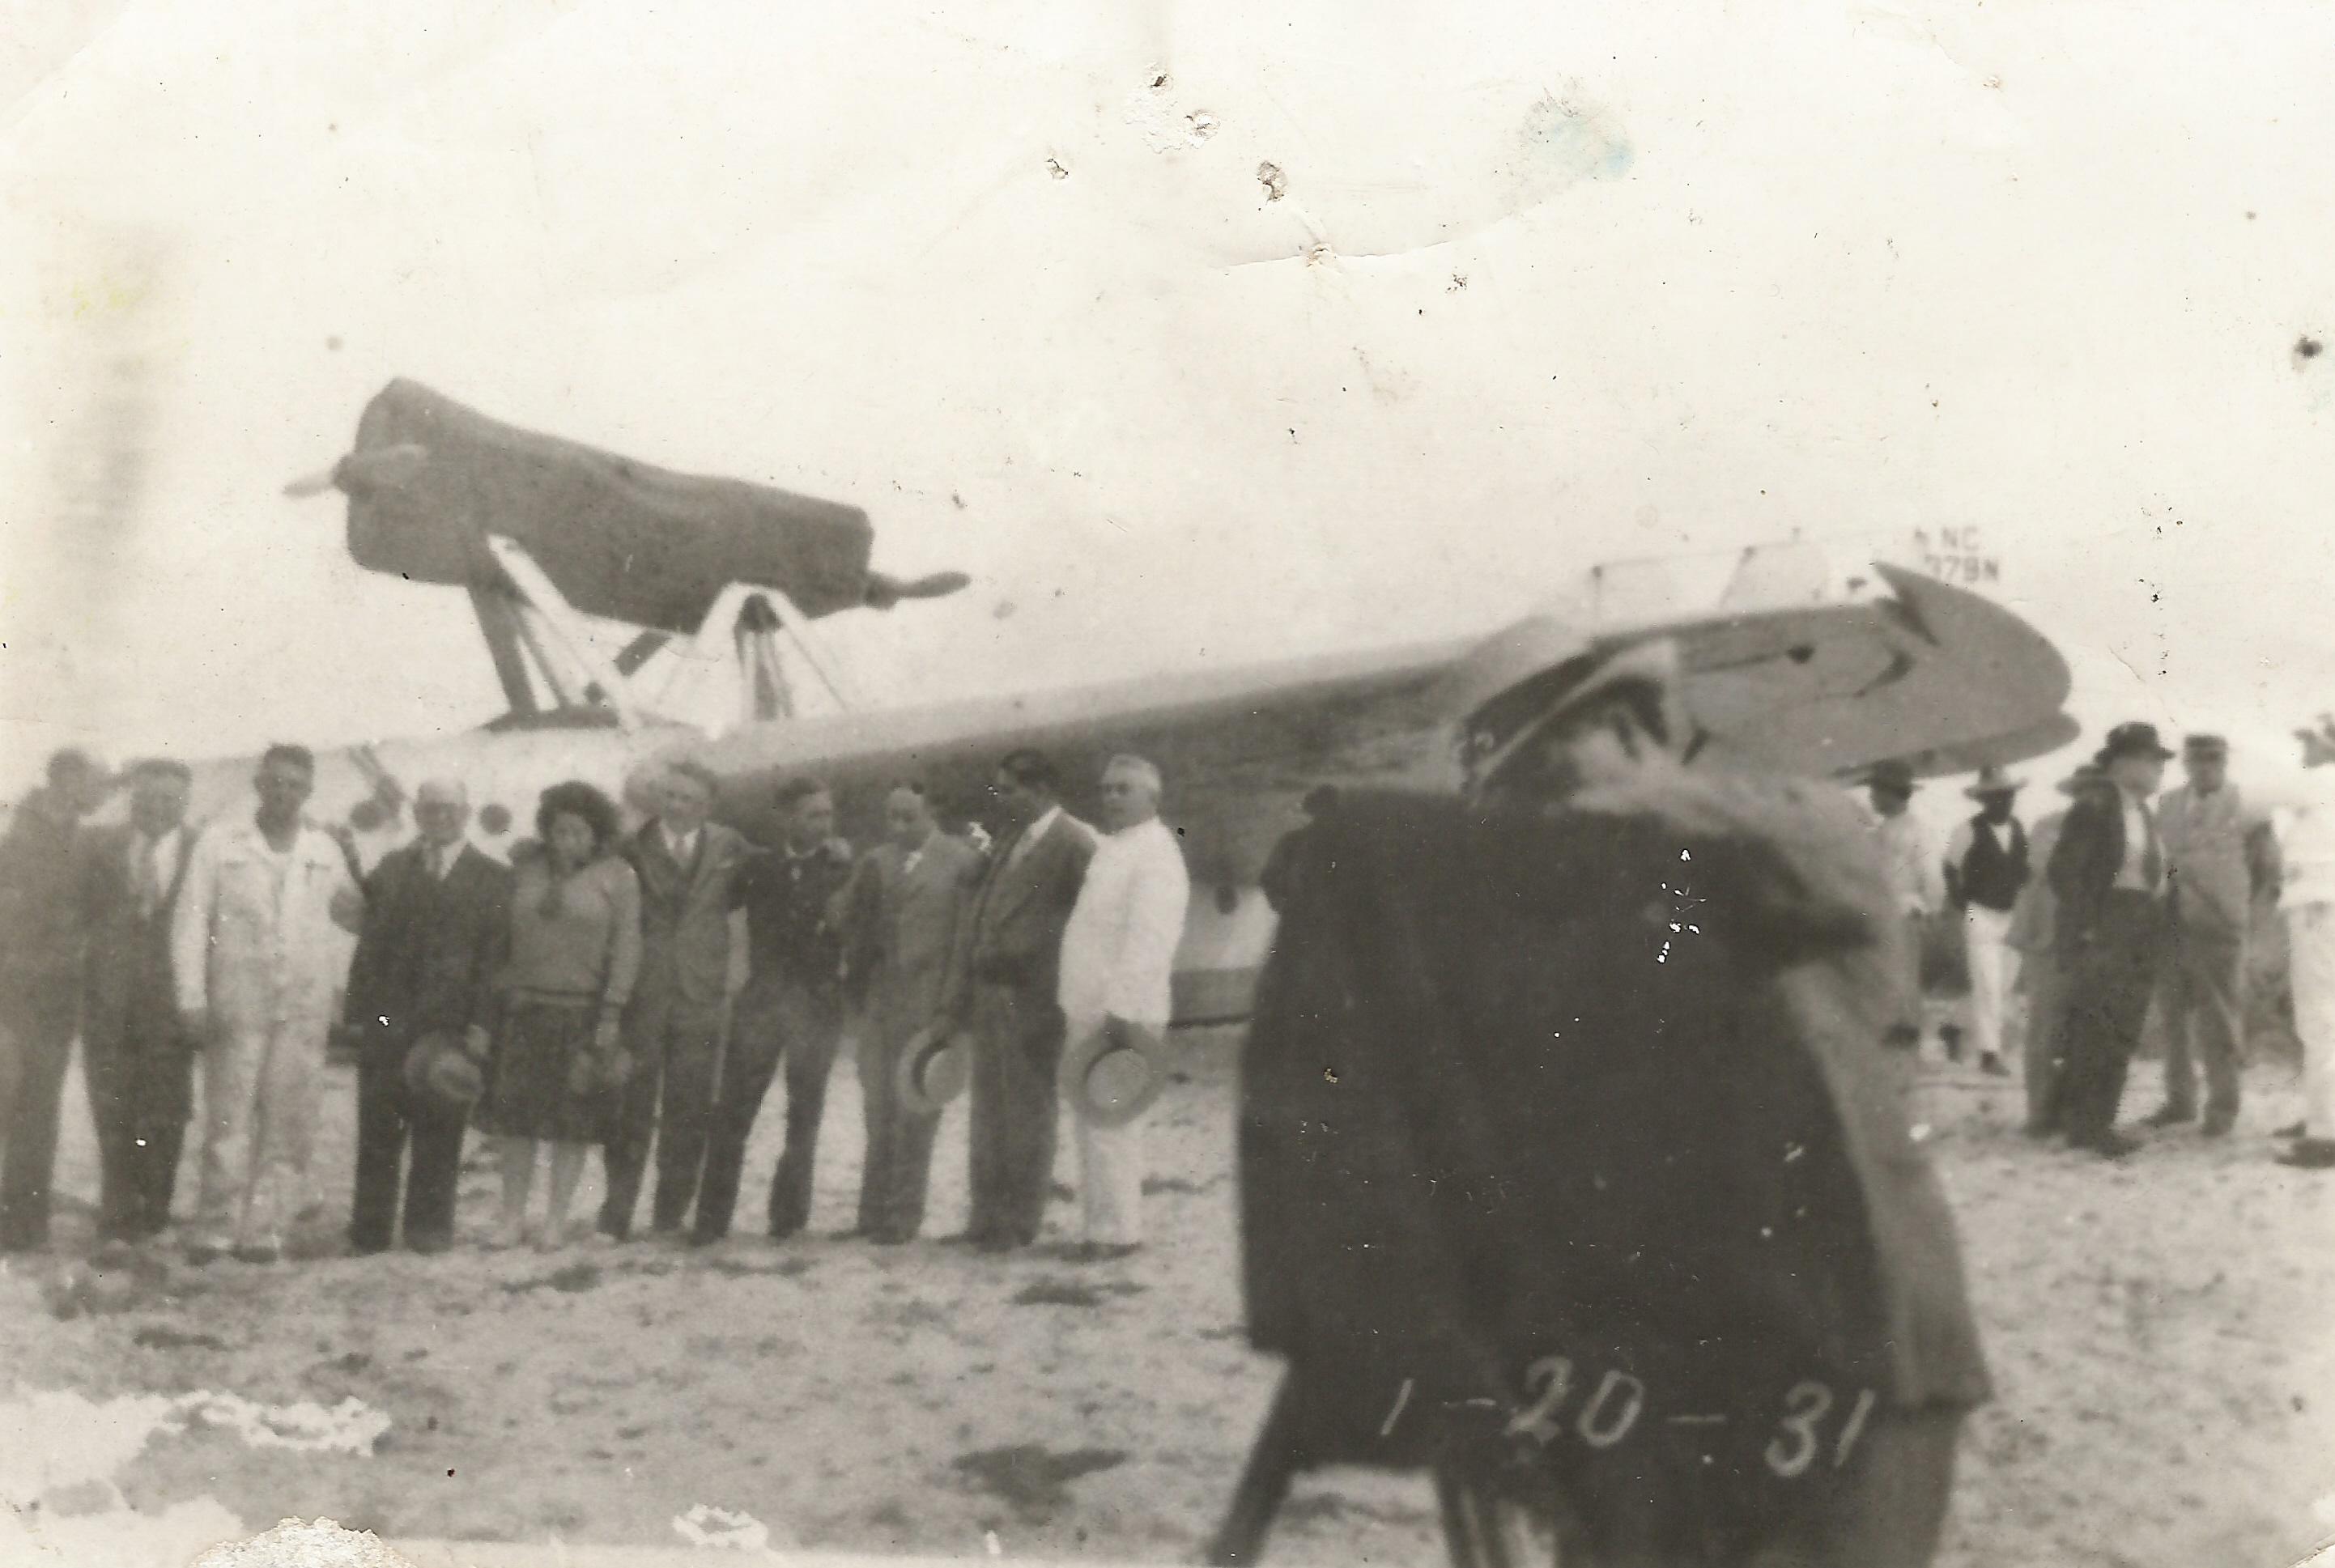 1. Primera ruta internacional Habana-Progreso llamado Charle